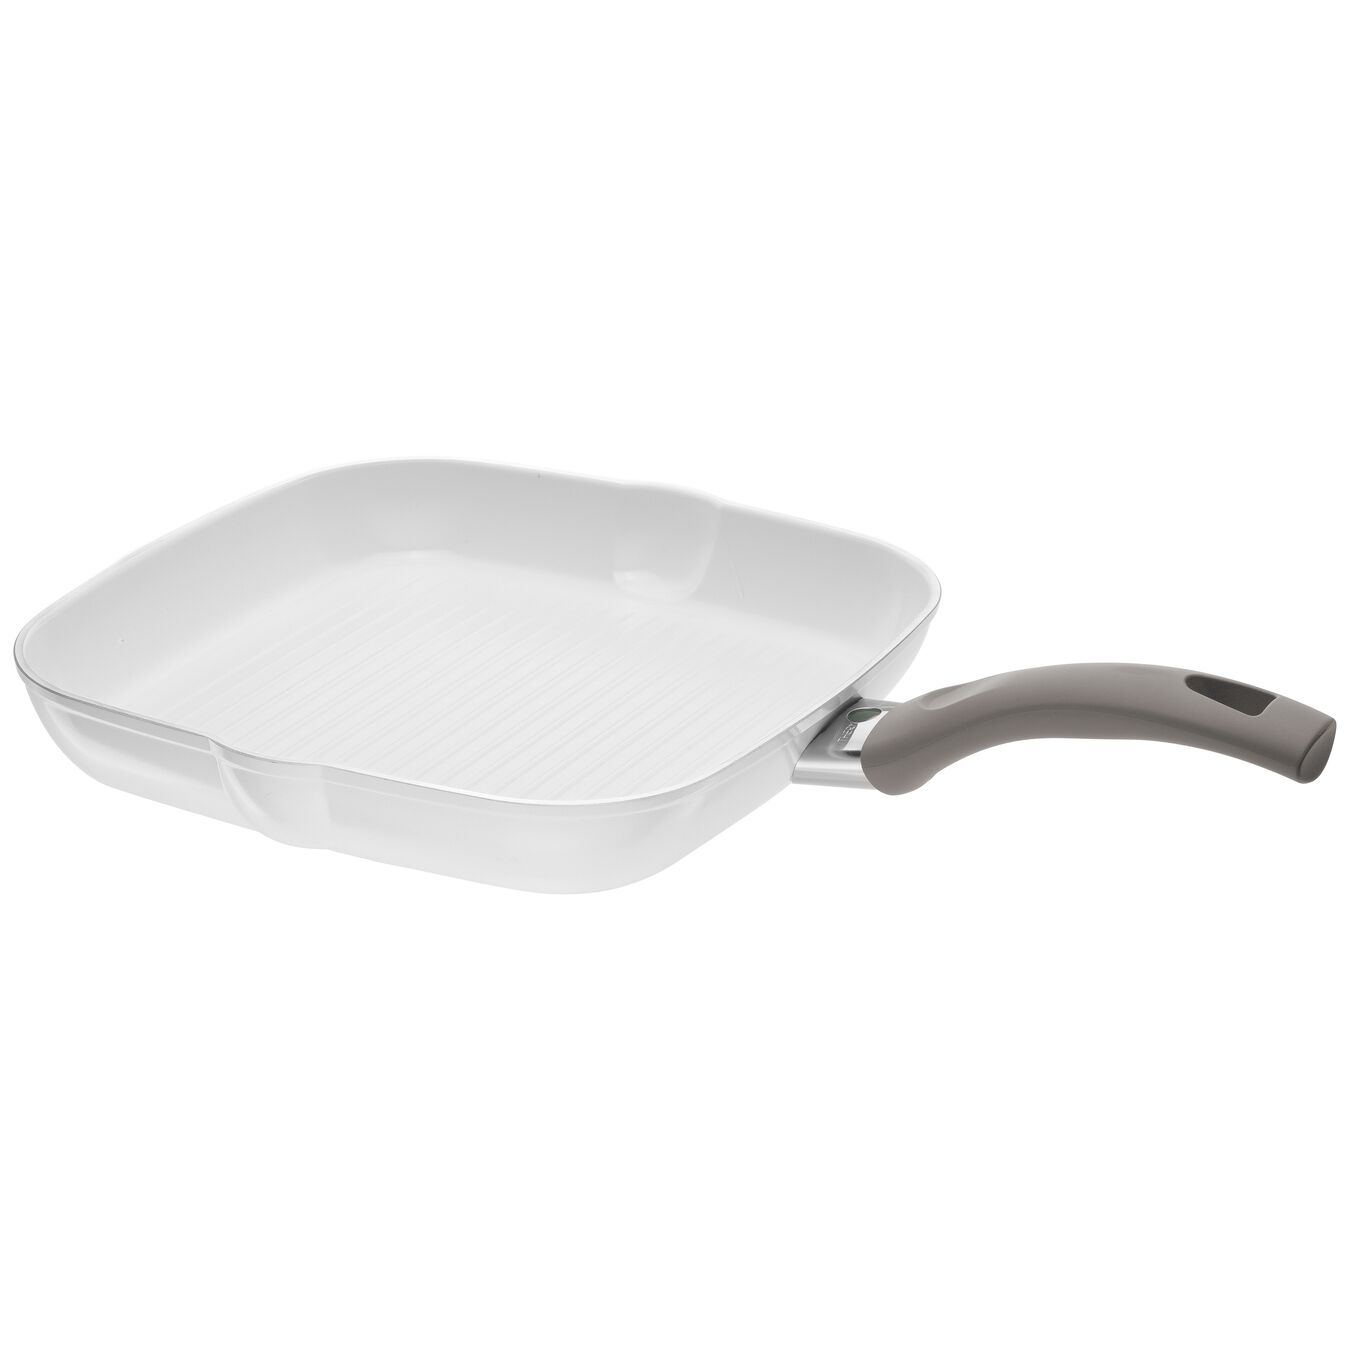 Grillpfanne 28 cm, Aluminium, Weiß,,large 1